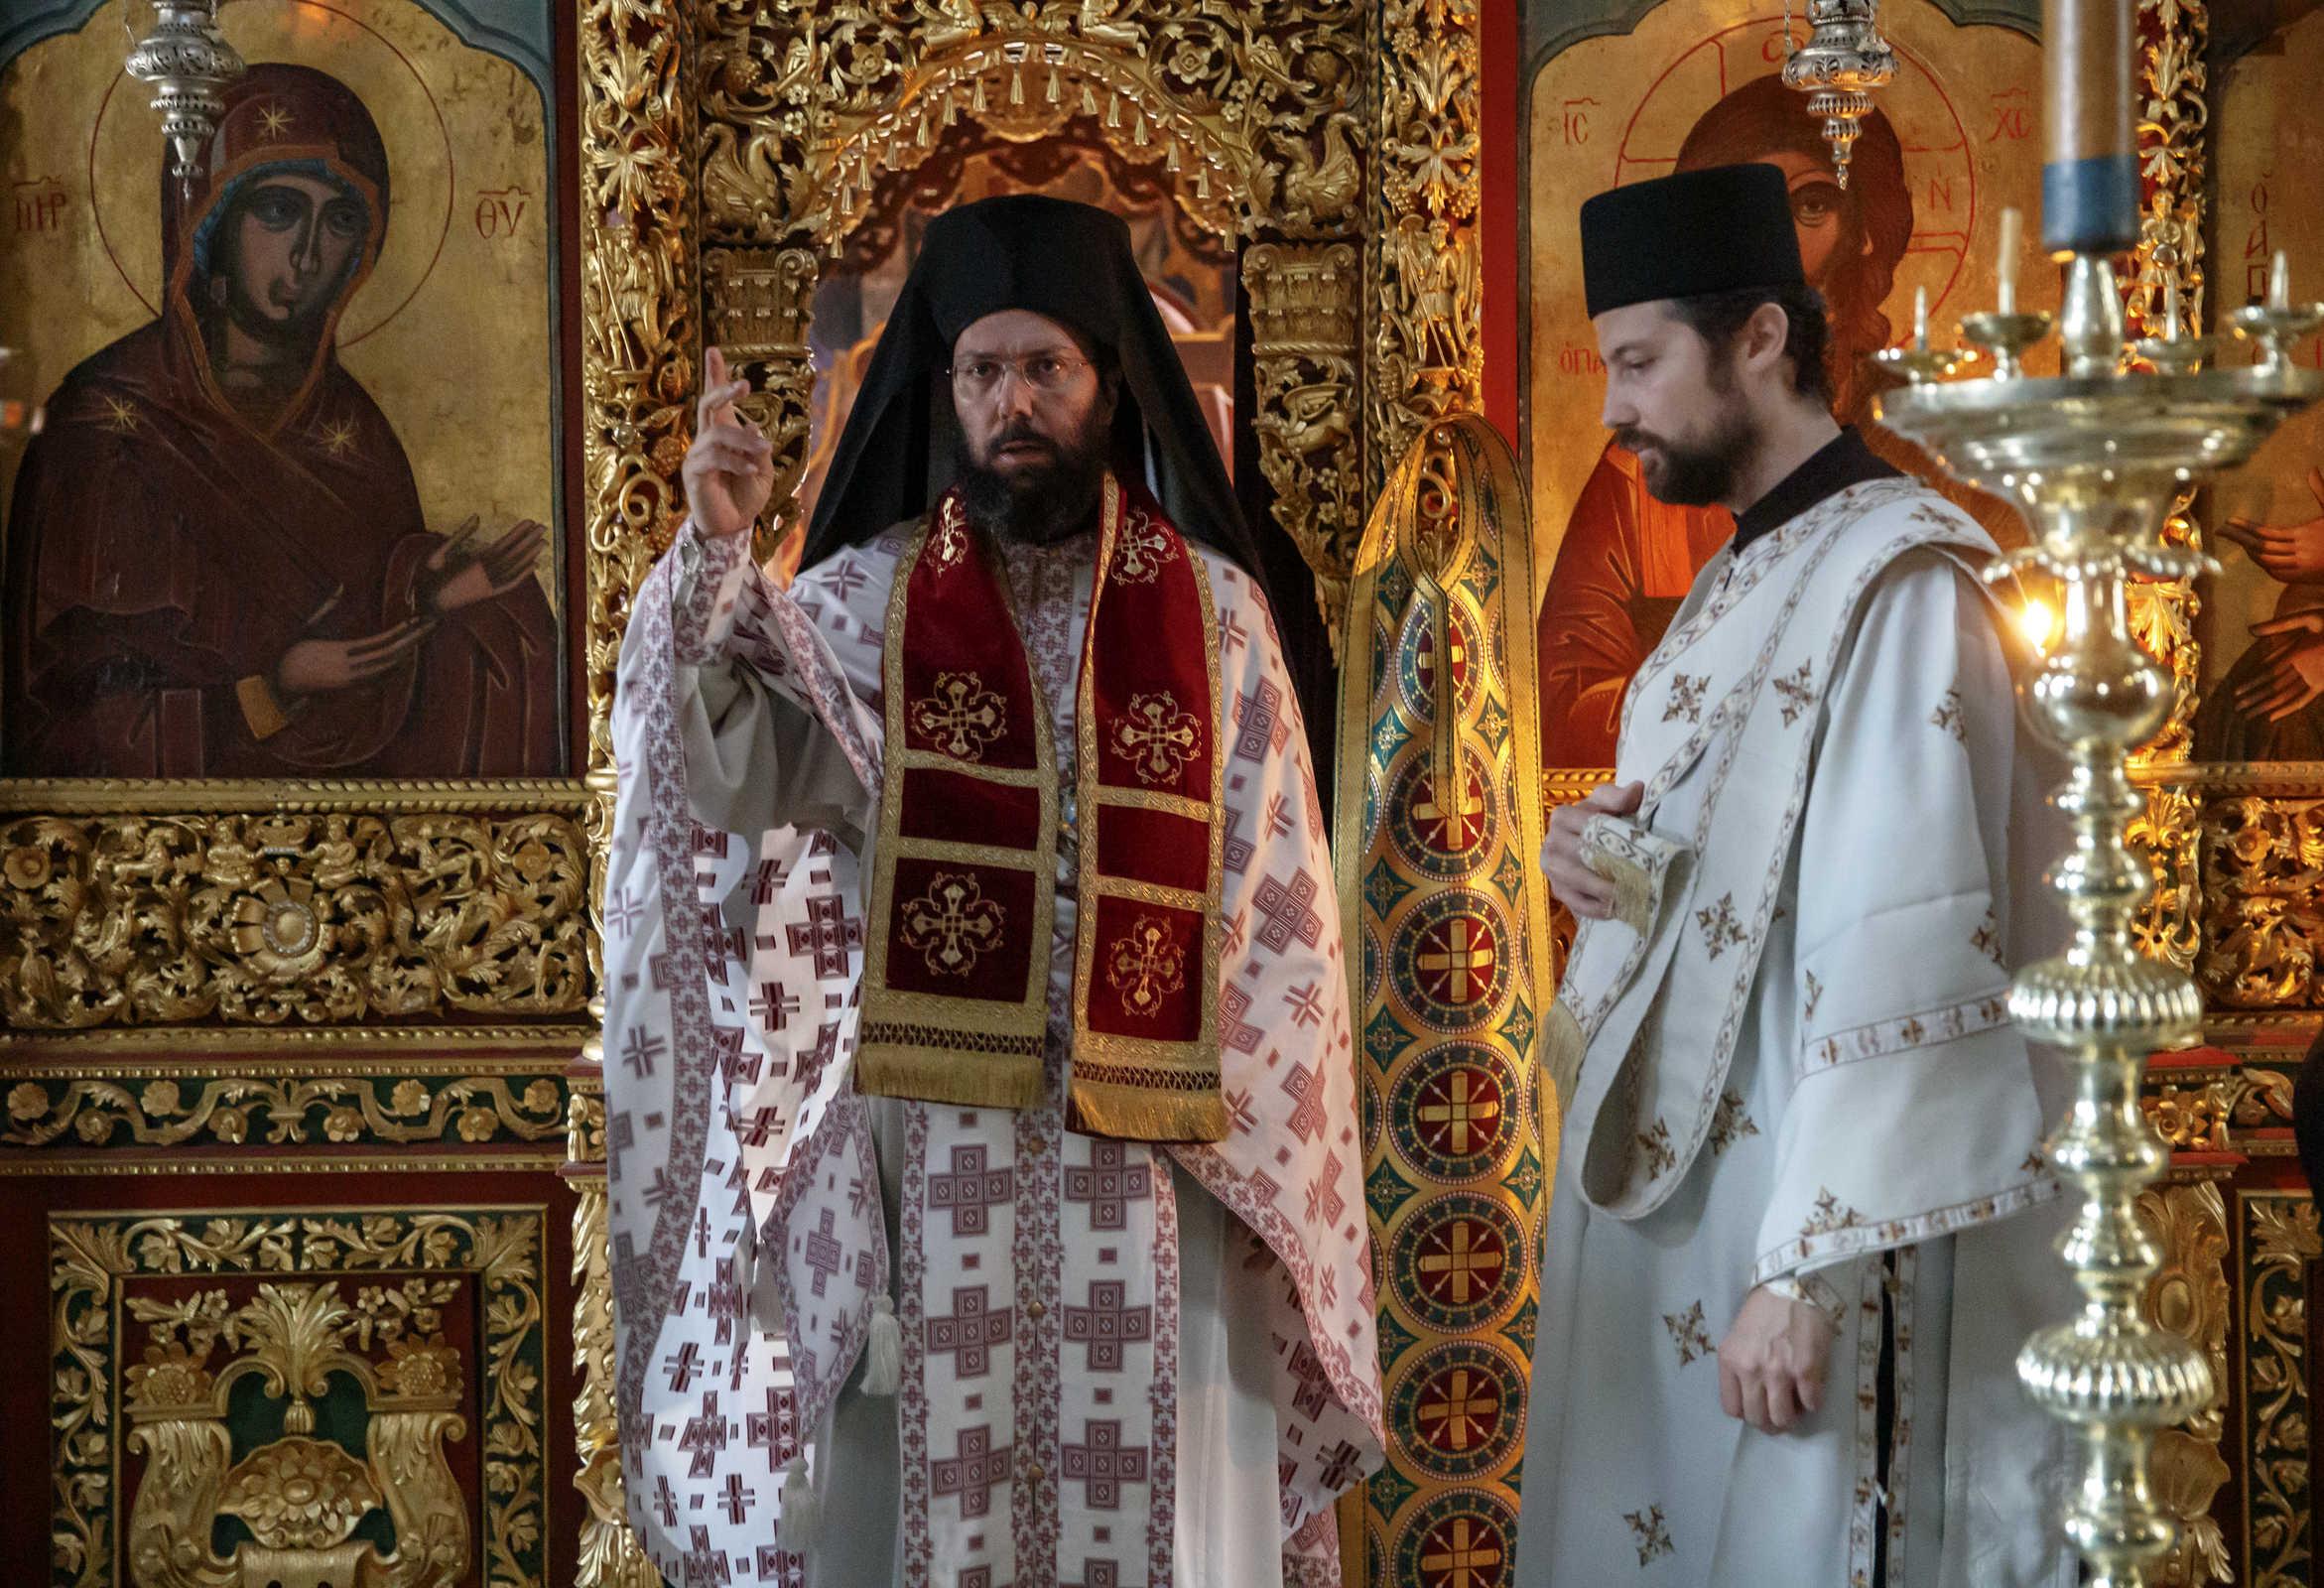 The orthodox bishop - (C) Vatopedi monastery, Mount Athos